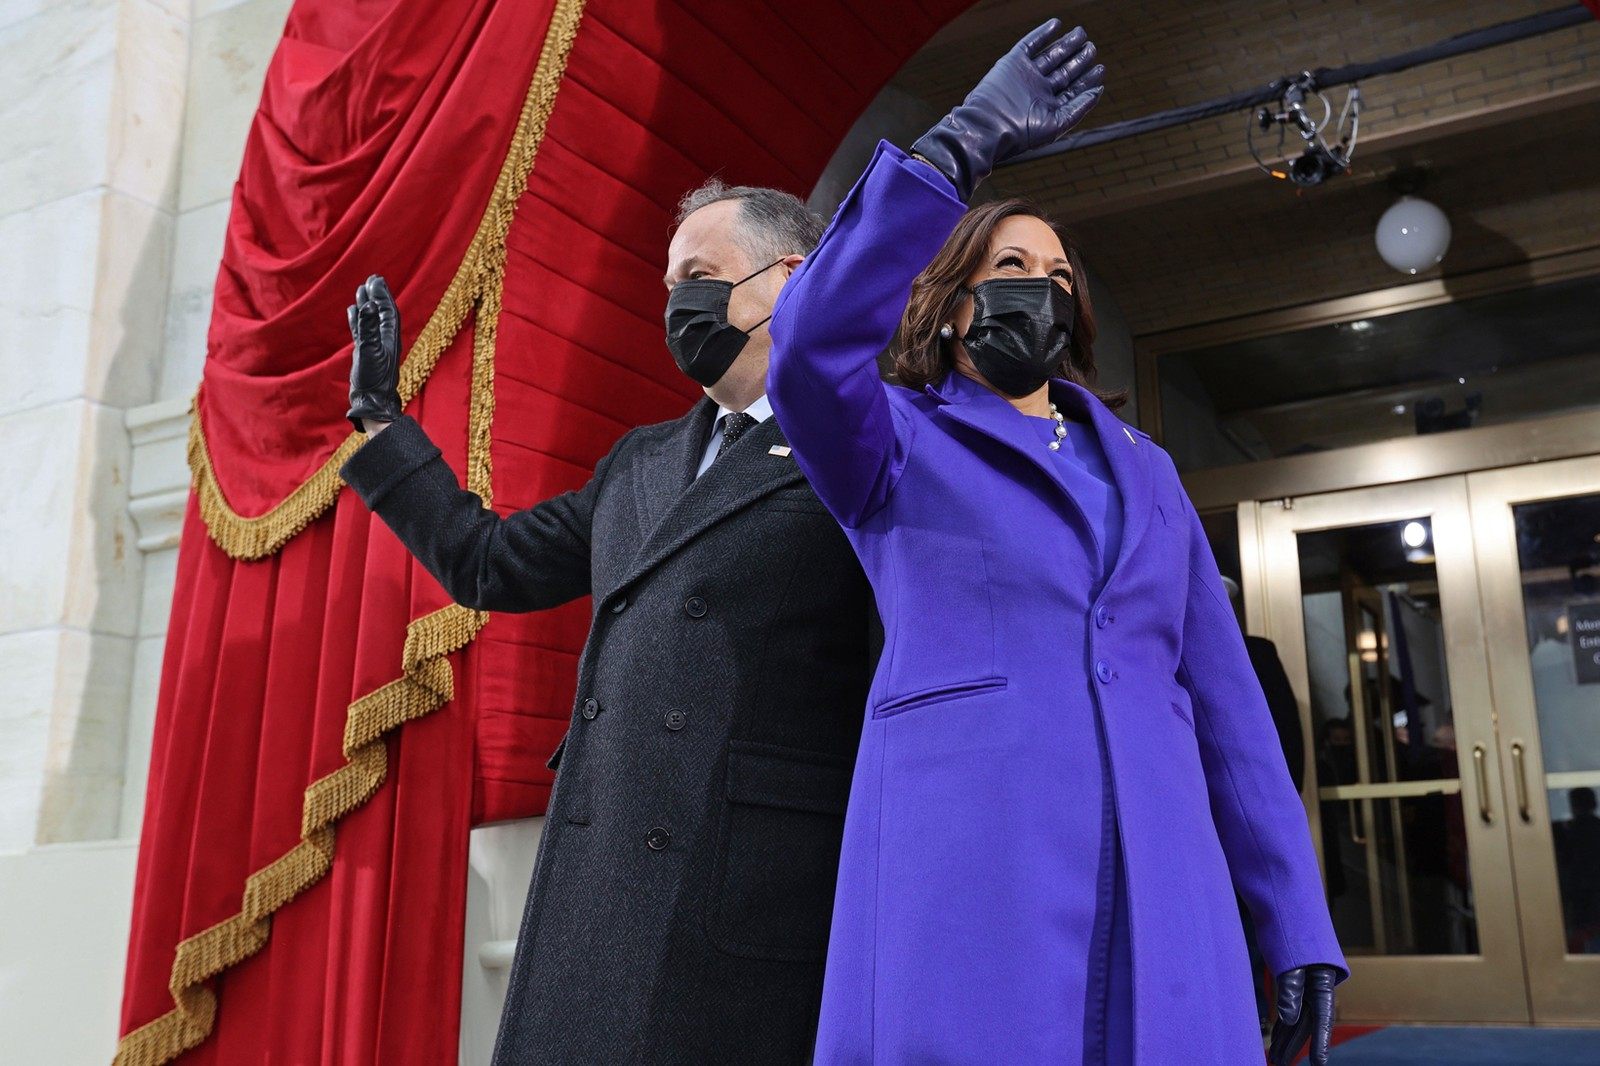 Kamala Harris Joe Jill Biden 59th Presidential Inauguration Day 2021